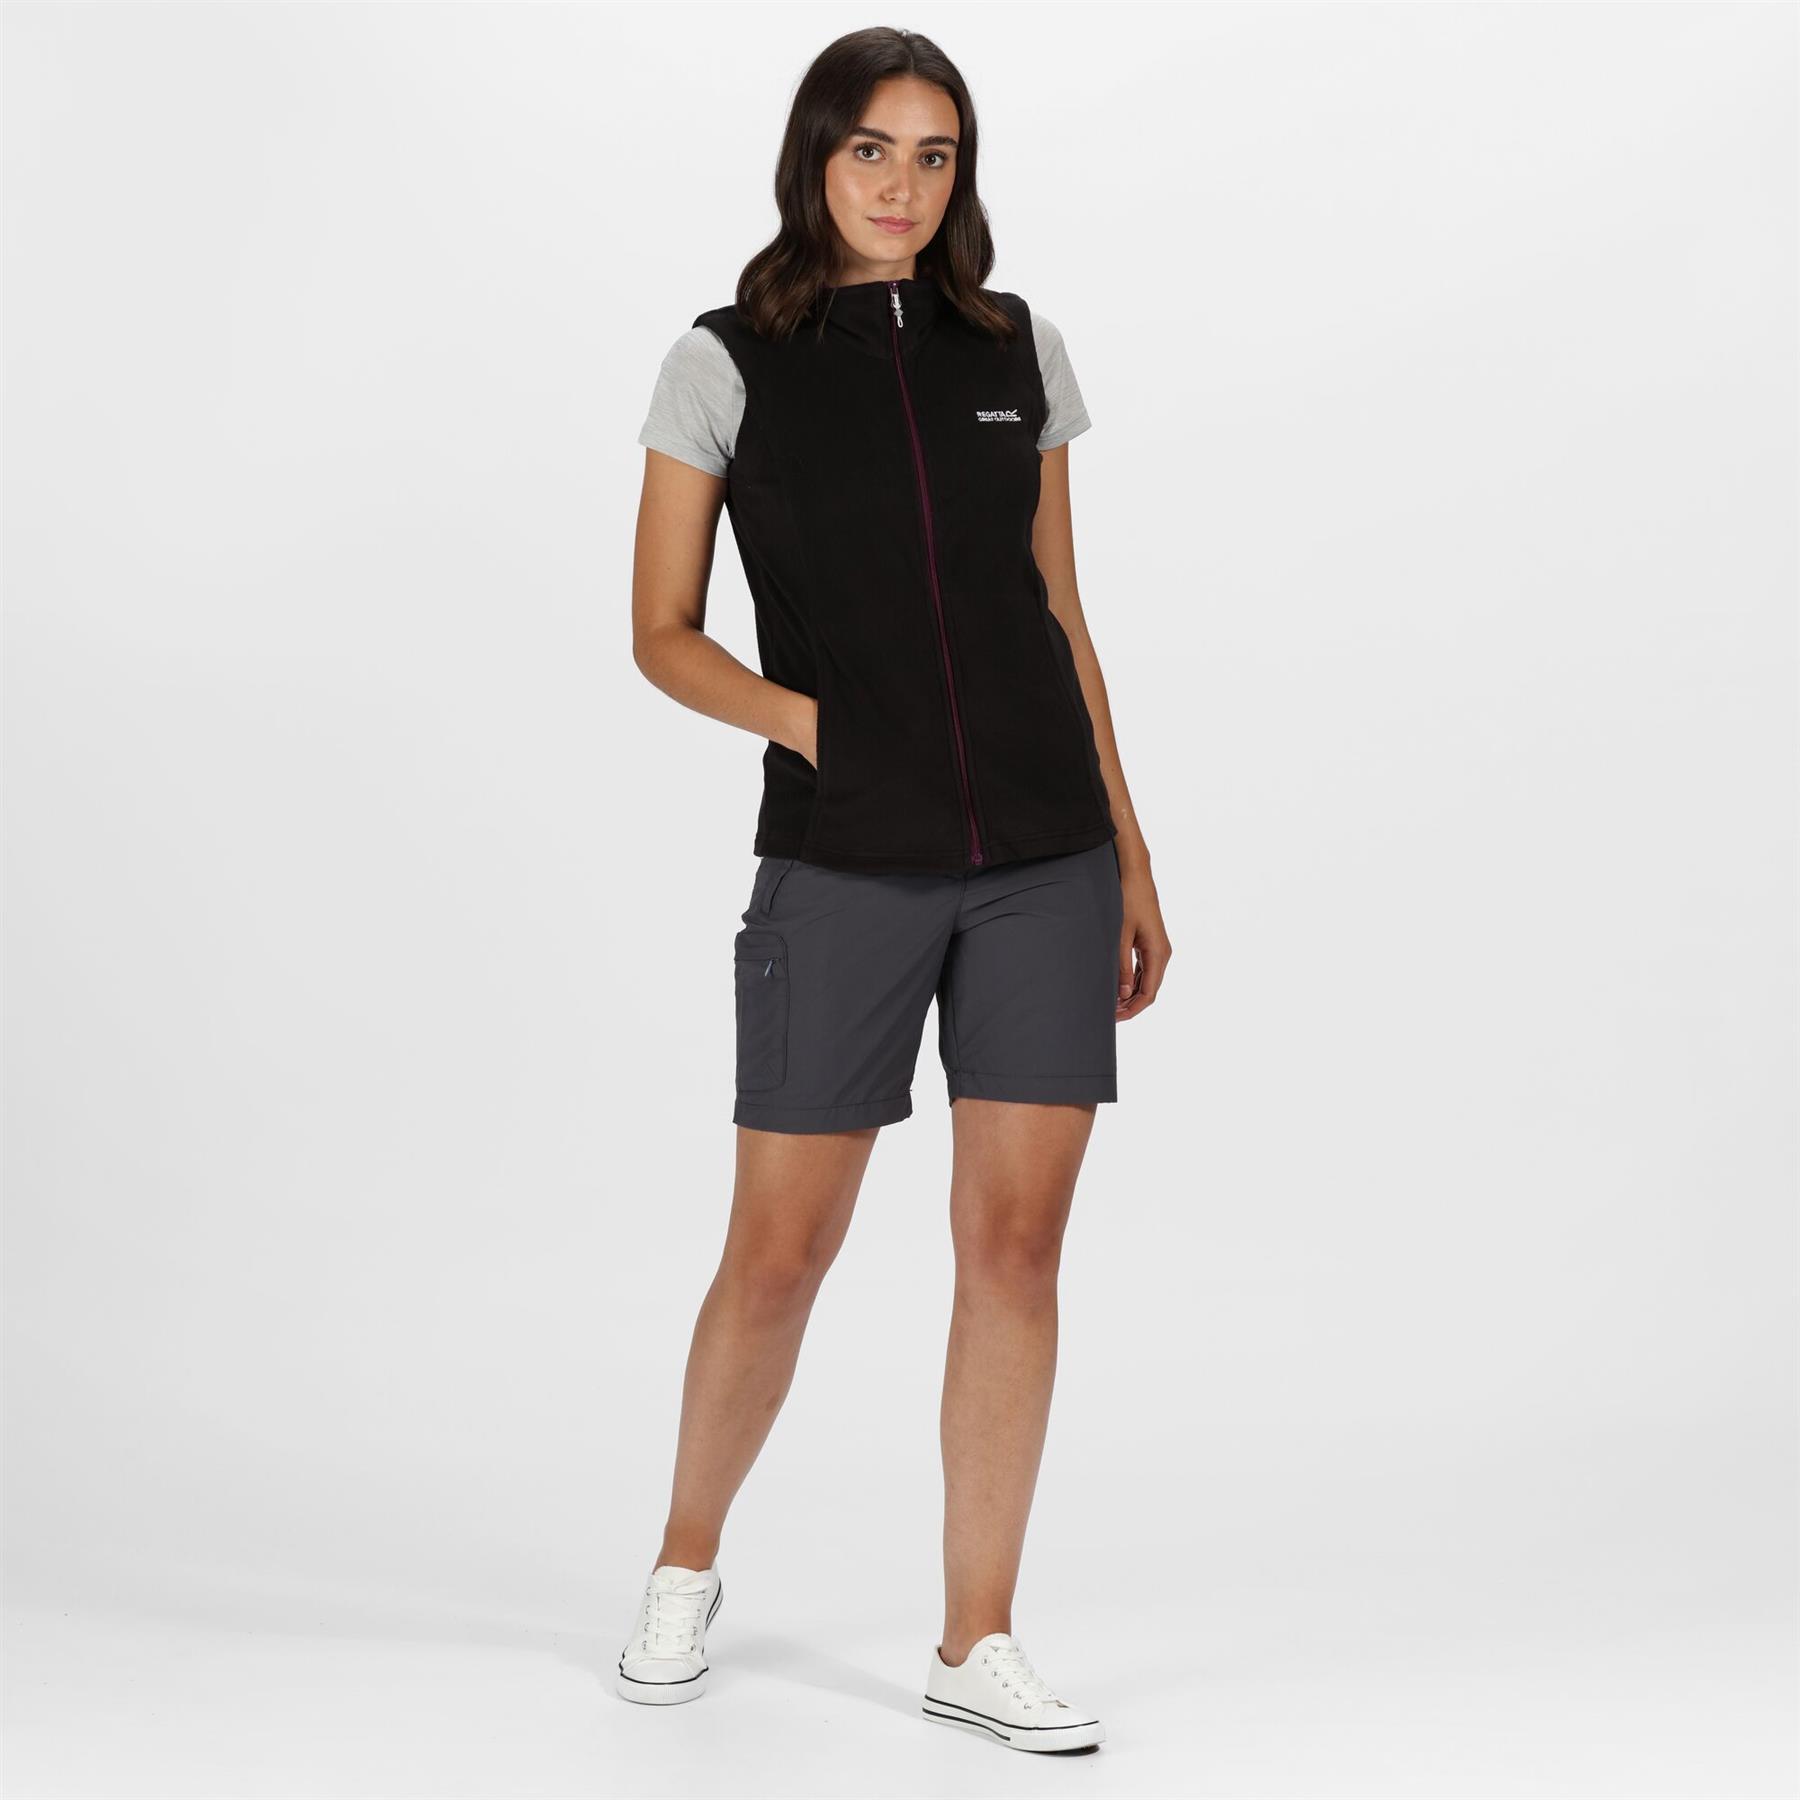 miniatuur 4 - Regatta Womens Sweetness Full Zip Micro Fleece Casual Bodywarmer Waistcoat